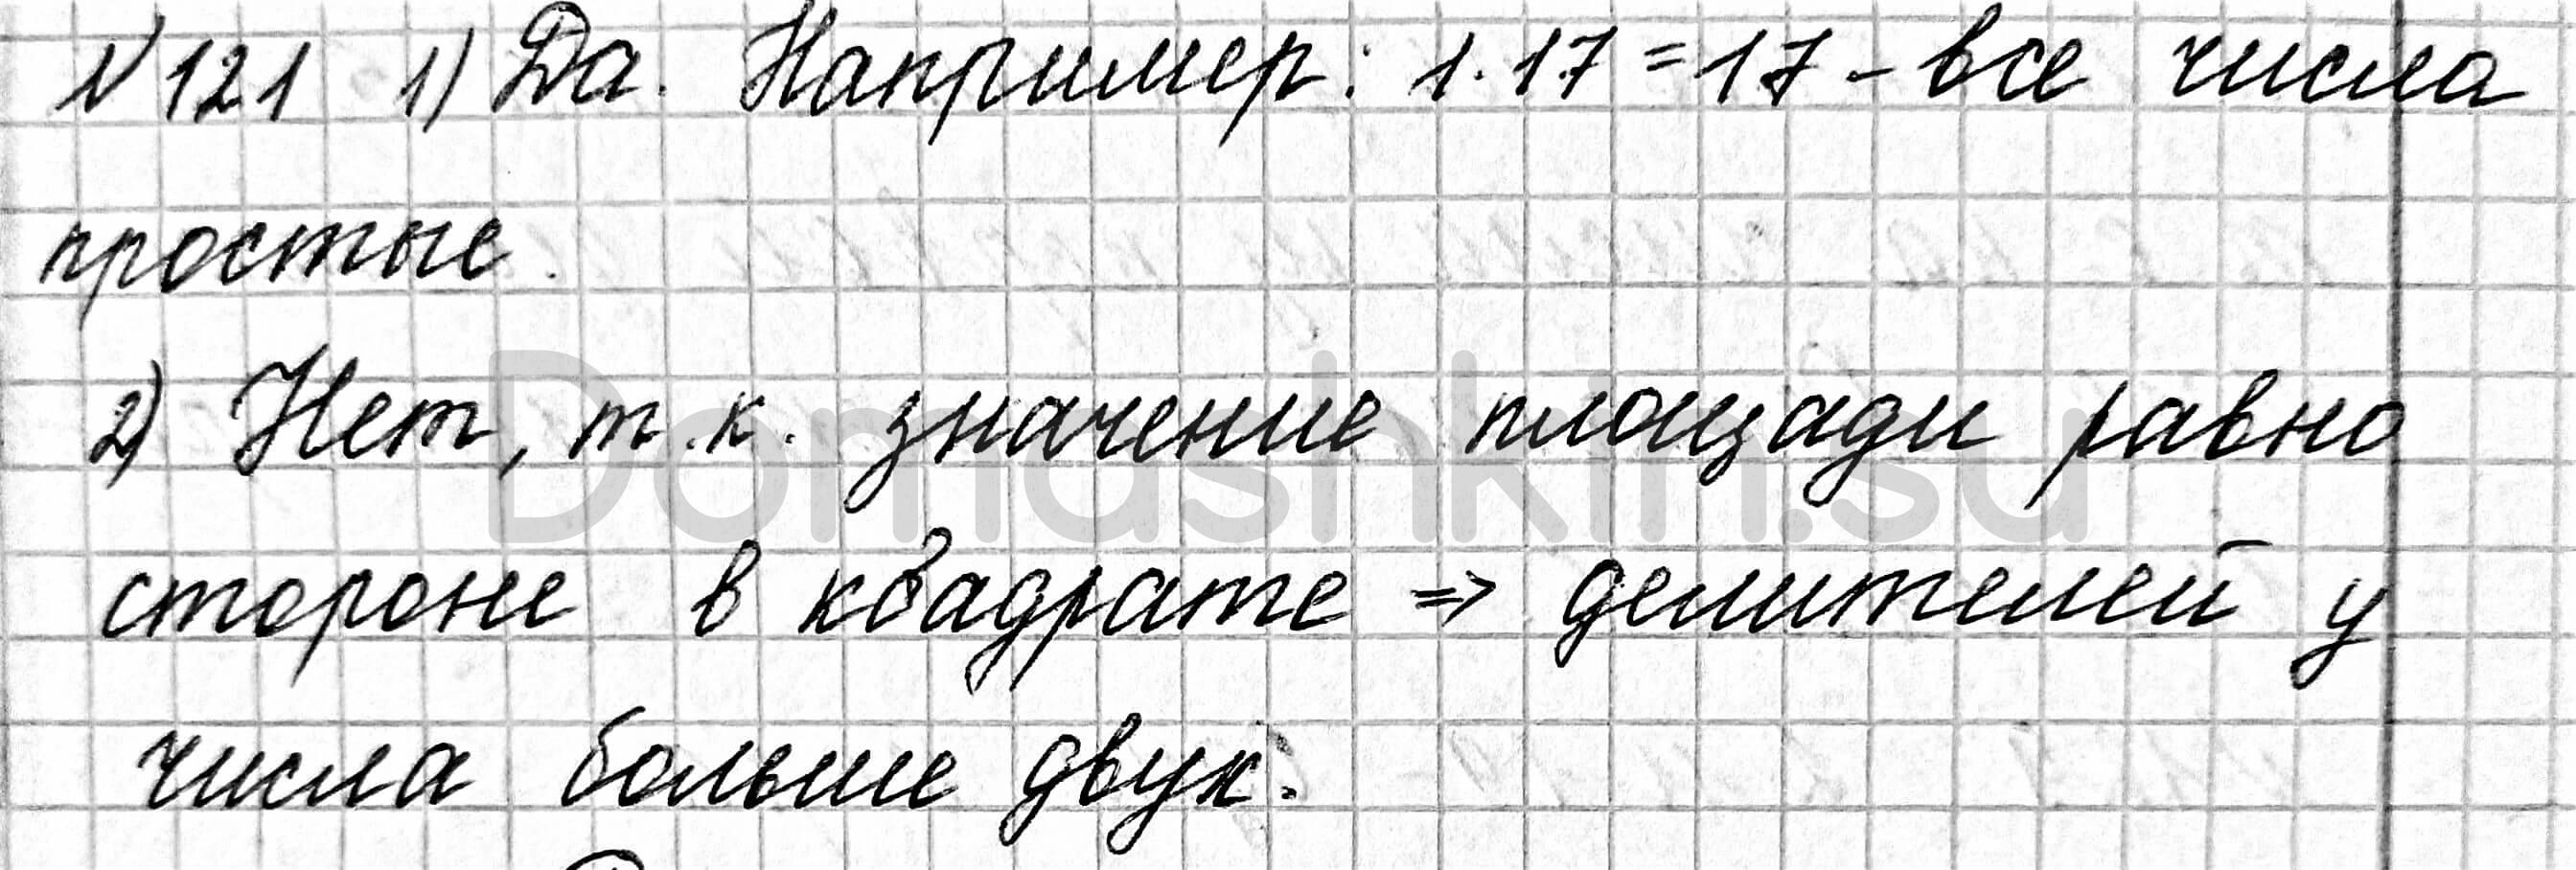 Математика 6 класс учебник Мерзляк номер 121 решение